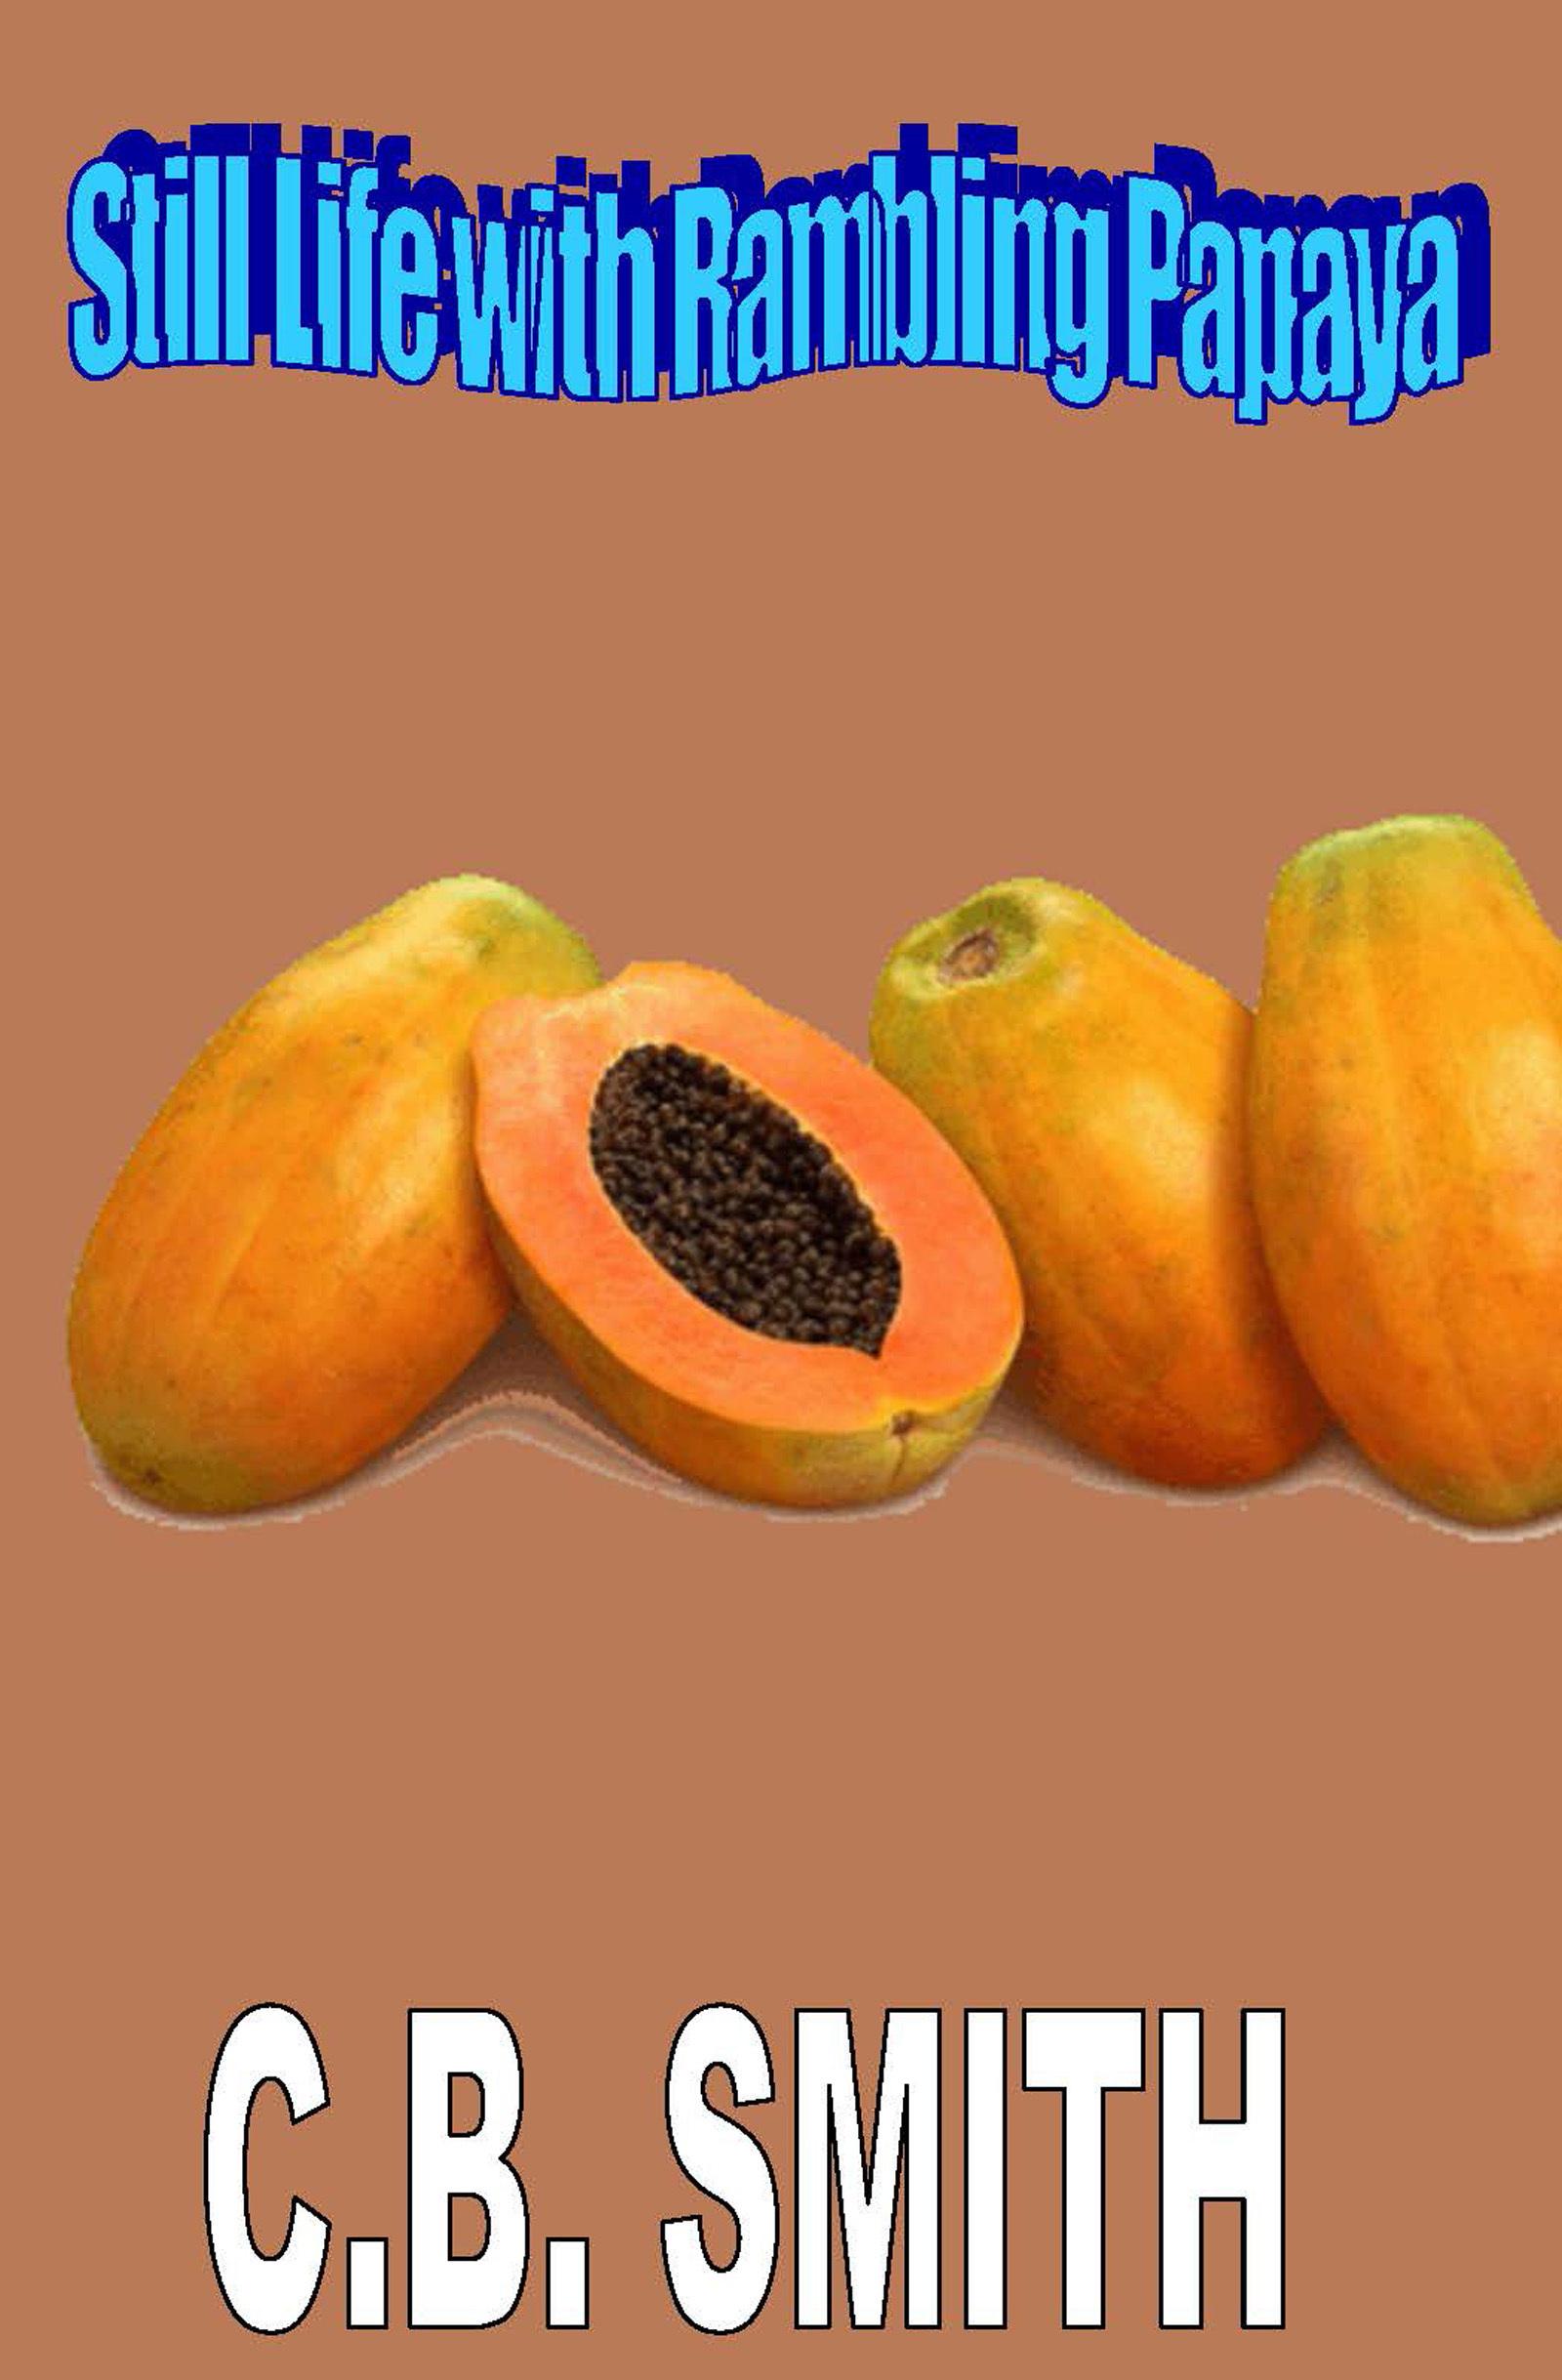 Still Life with Rambling Papaya C.B. Smith